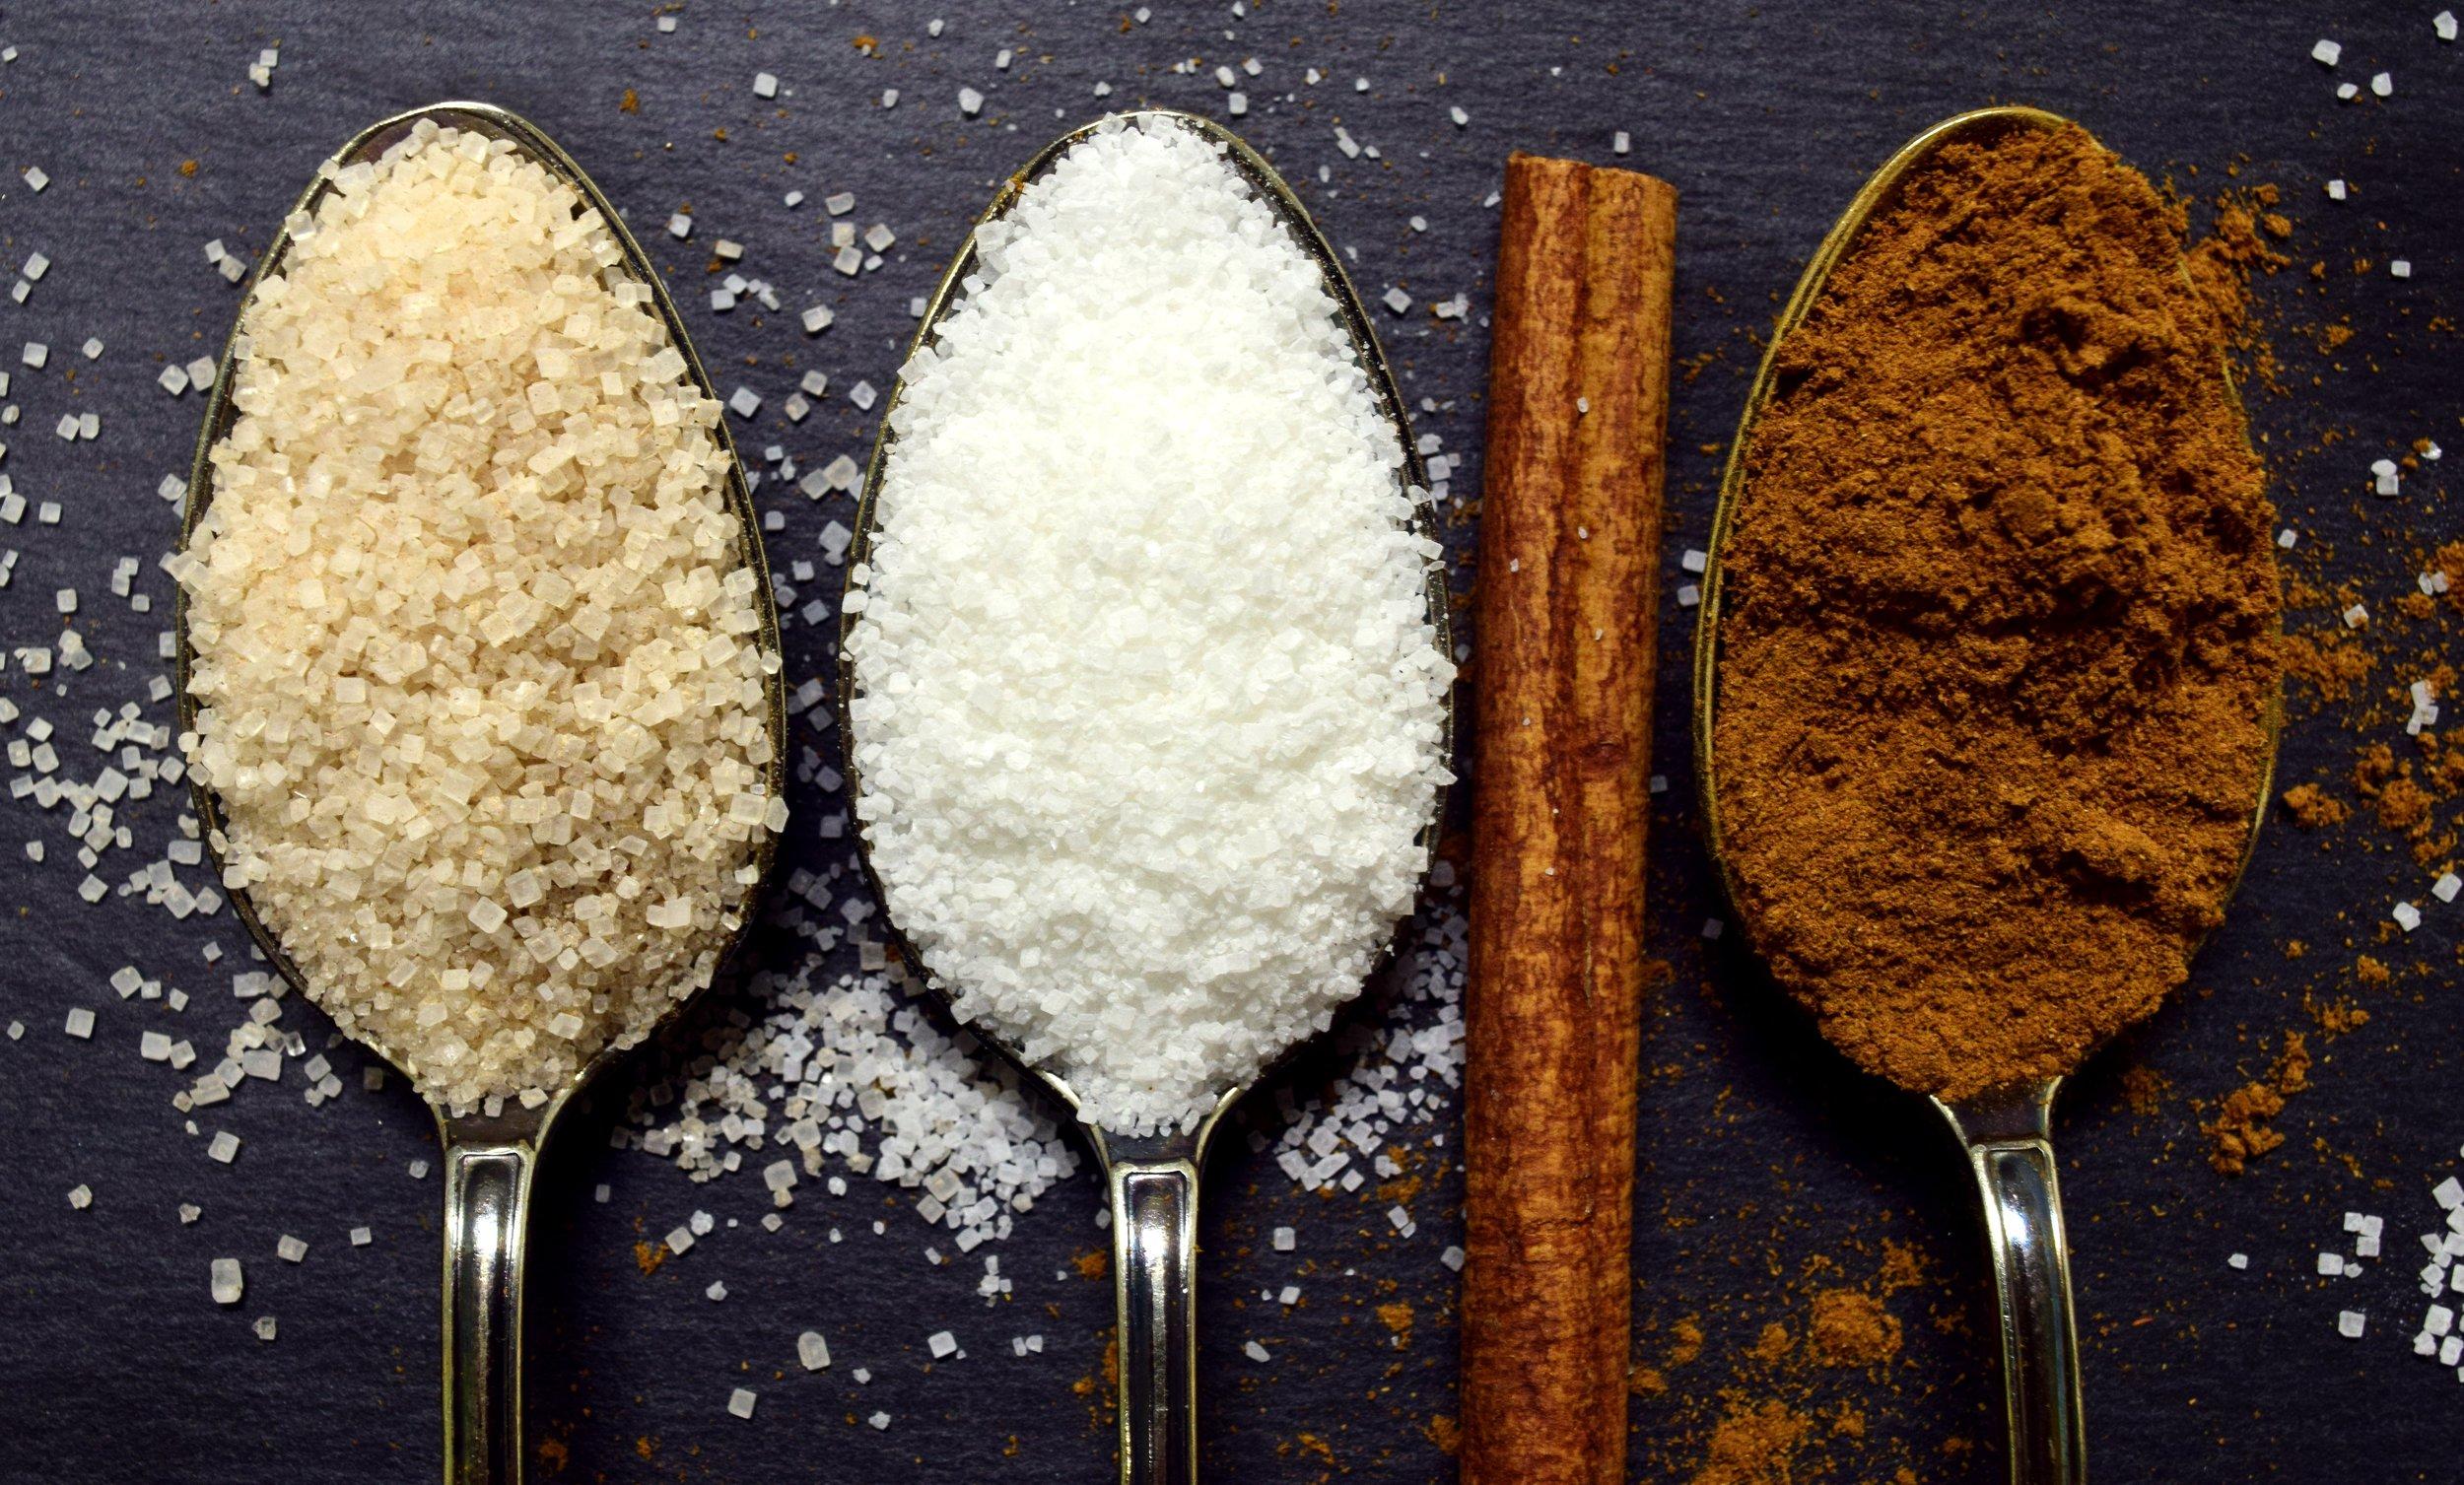 865 Candle Company - Sugar & Spice